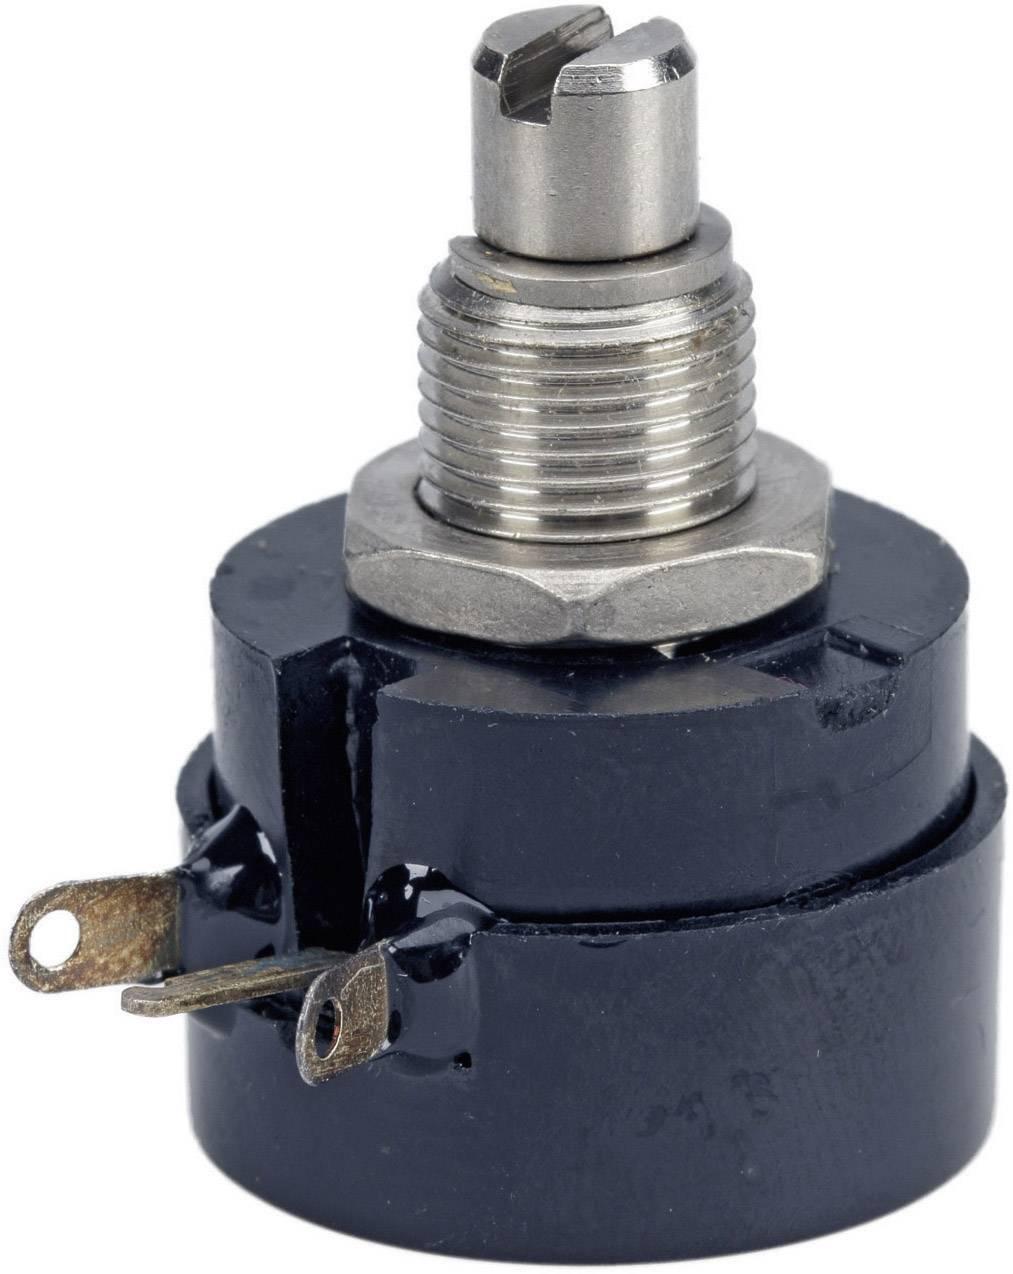 Drôtový potenciometer TT Electro, 3101106960, 5 kΩ, 0.5 W, ± 10%